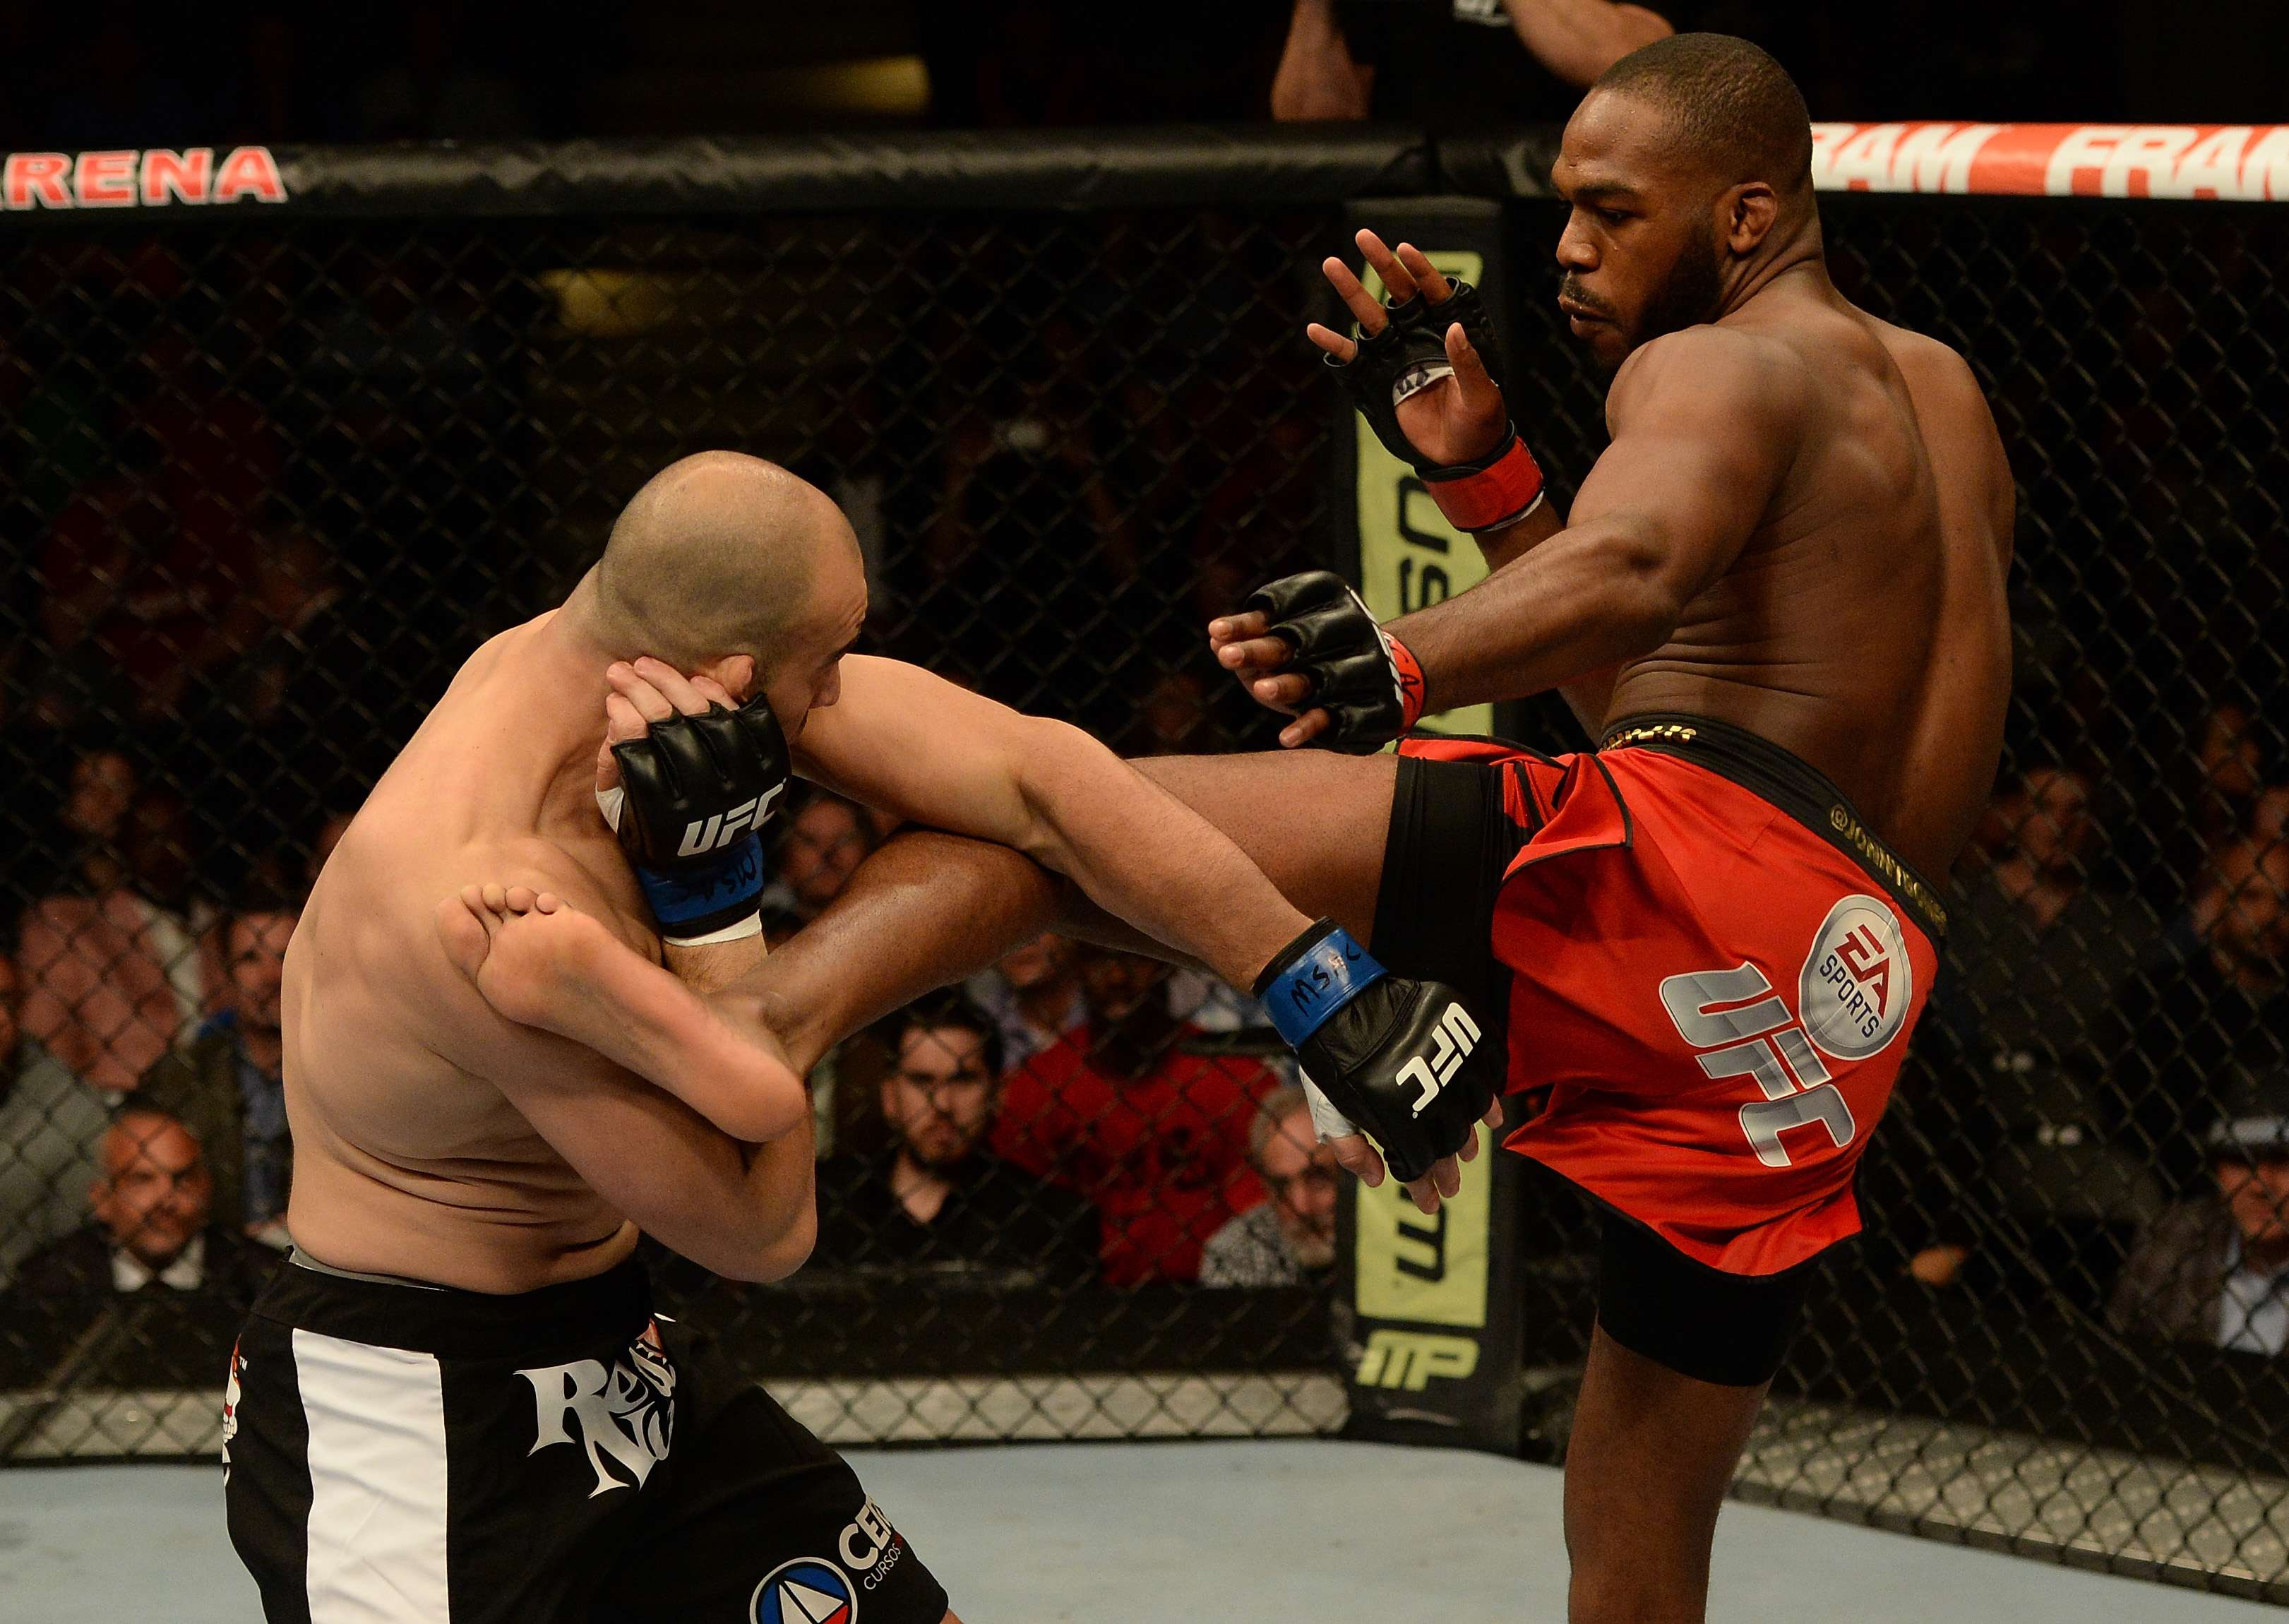 Jon 'Bones' Jones castiga a Glover Teixeira en UFC 172